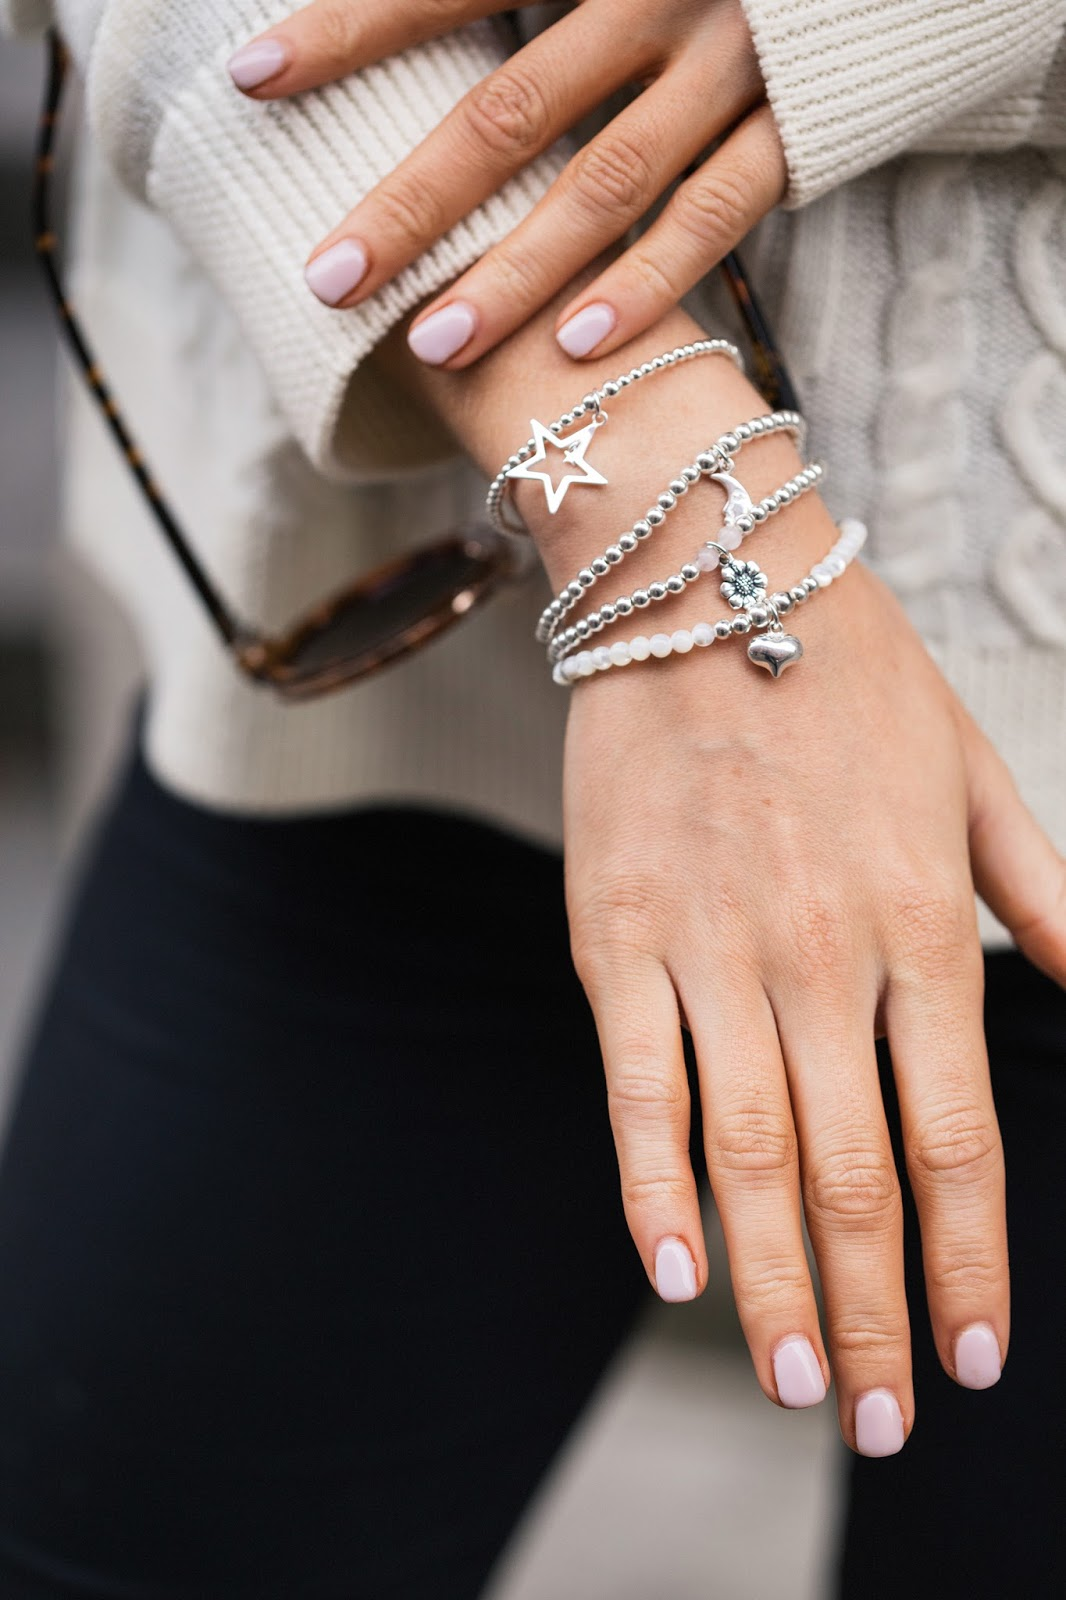 nails inc white horse street